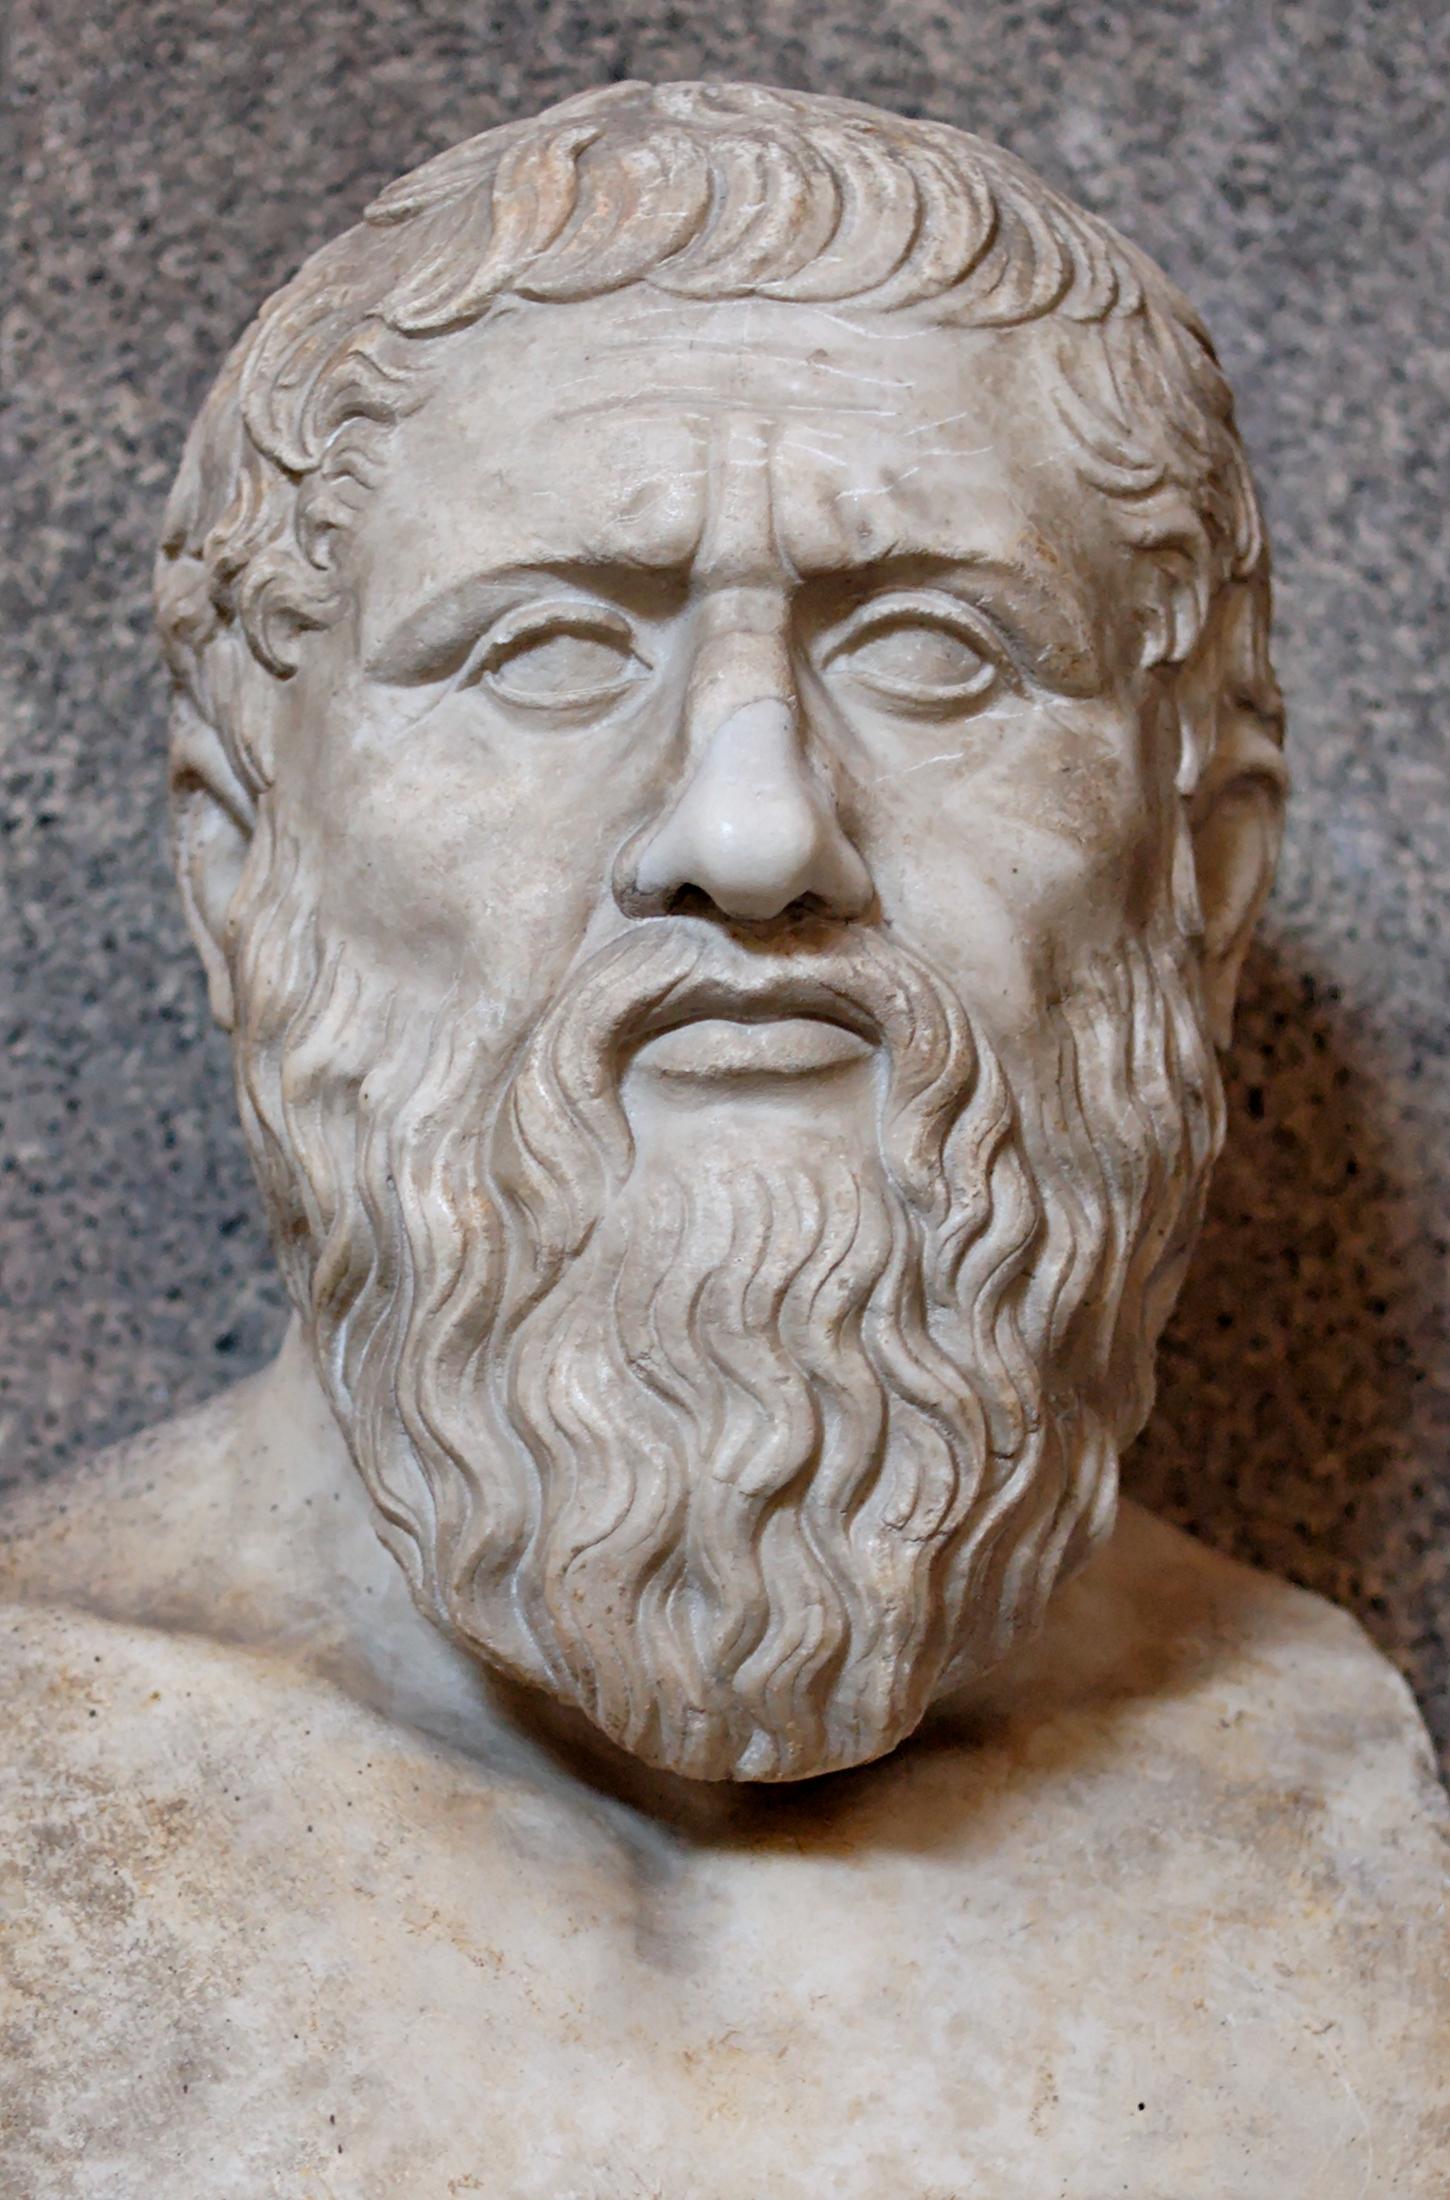 Did Socrates Say: 'When Debate is Lost, Slander Becomes Tool of the Loser'?